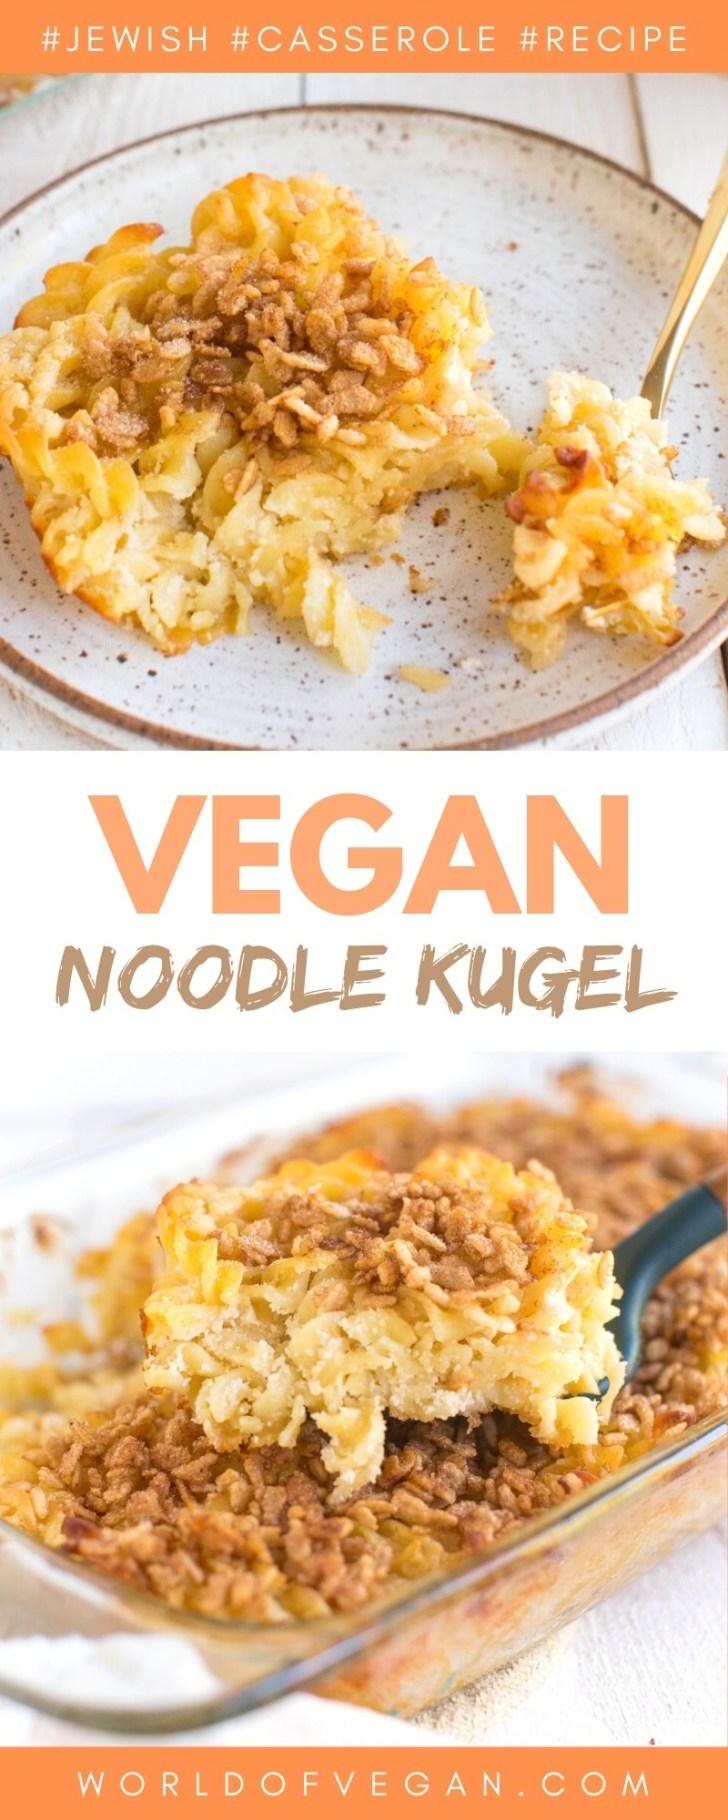 Vegan Jewish Noodle Kugel Recipe